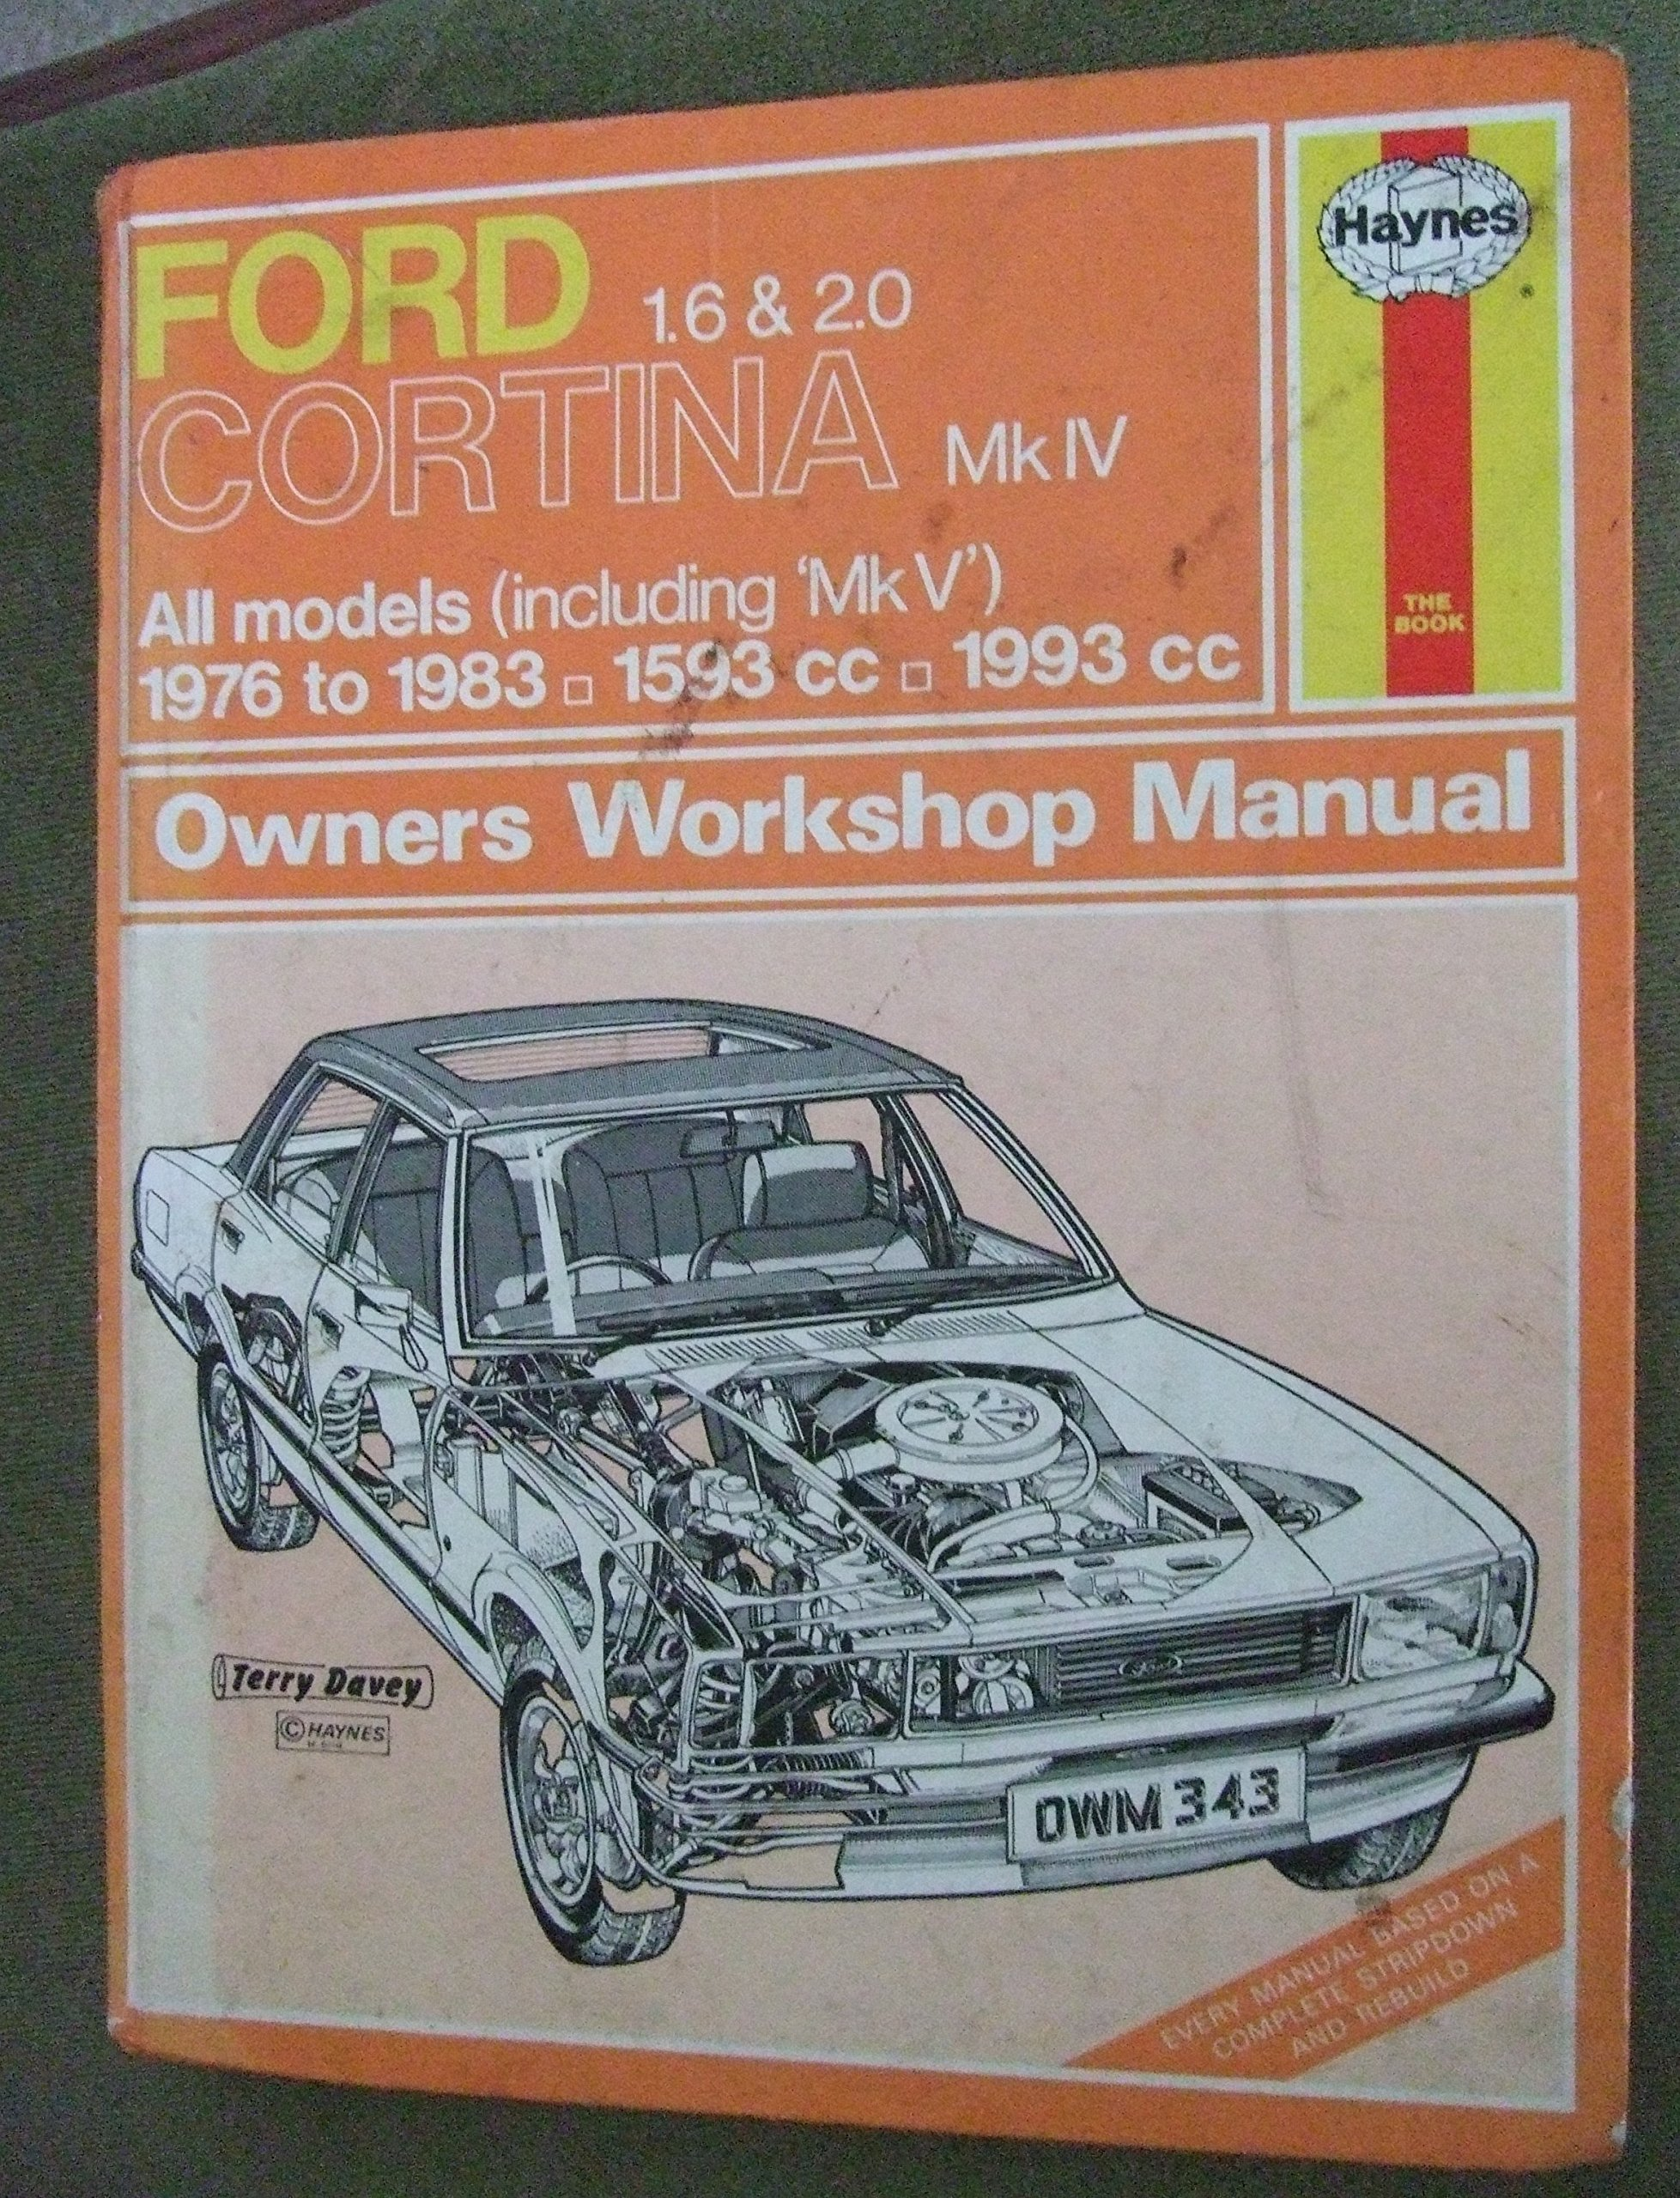 ford cortina mk iv 1 6 and 2 0 owners workshop manual amazon co uk rh amazon co uk Ford Corsair Ford Taunus